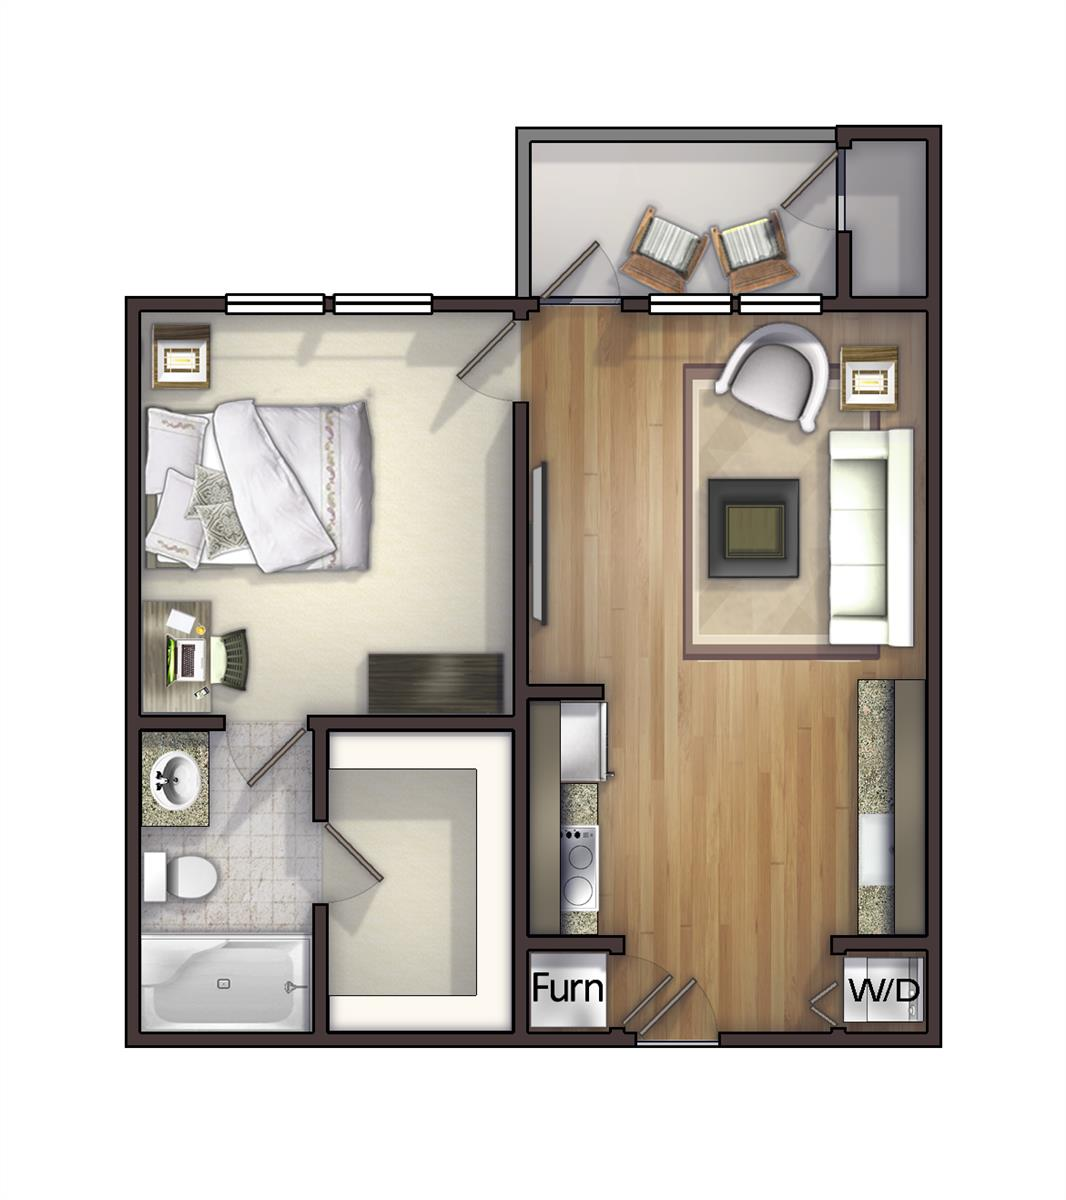 eagles south apartments apartment in auburn al